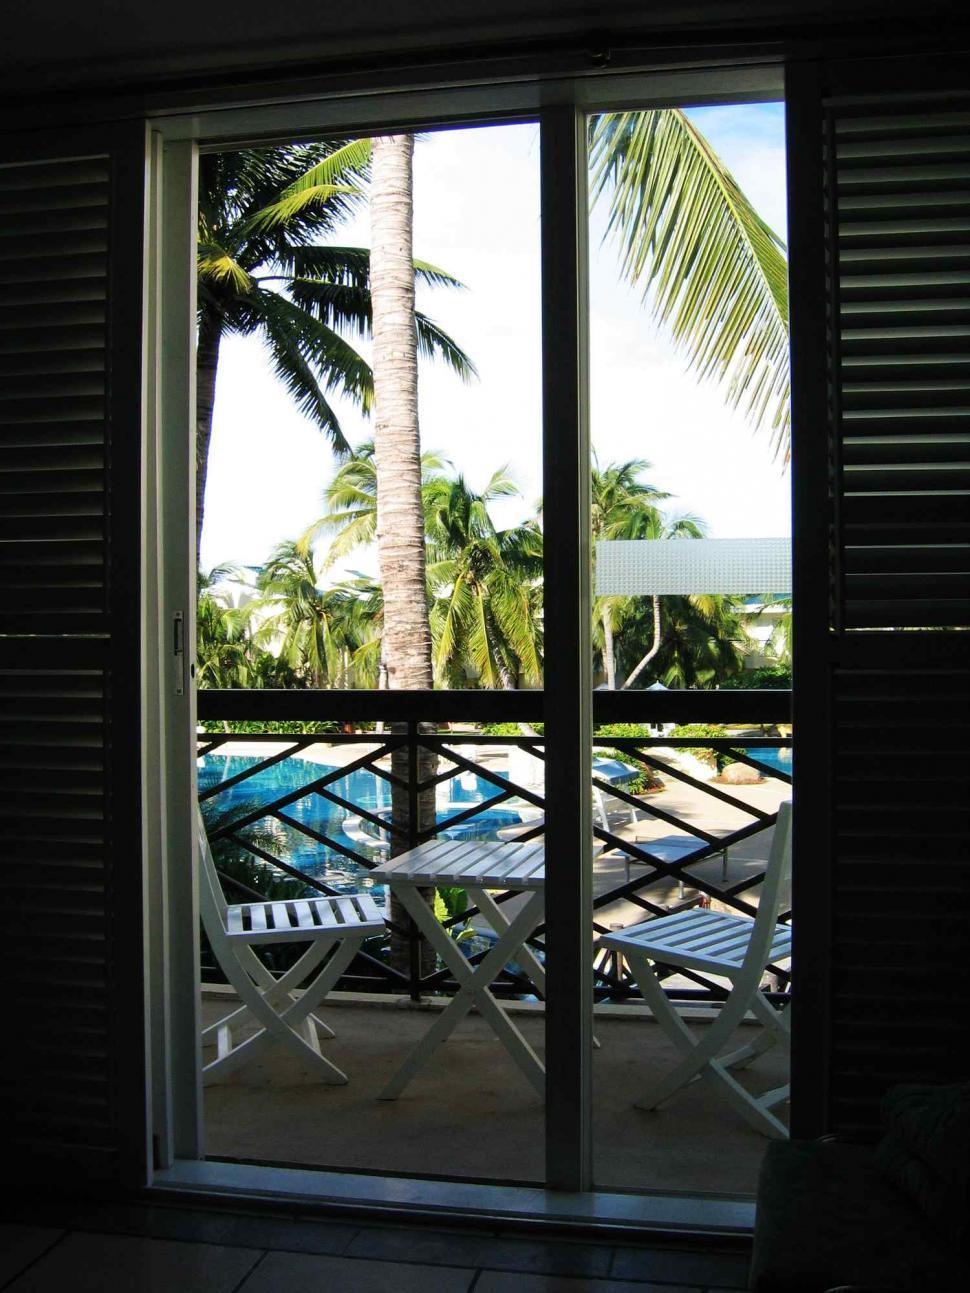 Download Free Stock HD Photo of Balcony of resort Online